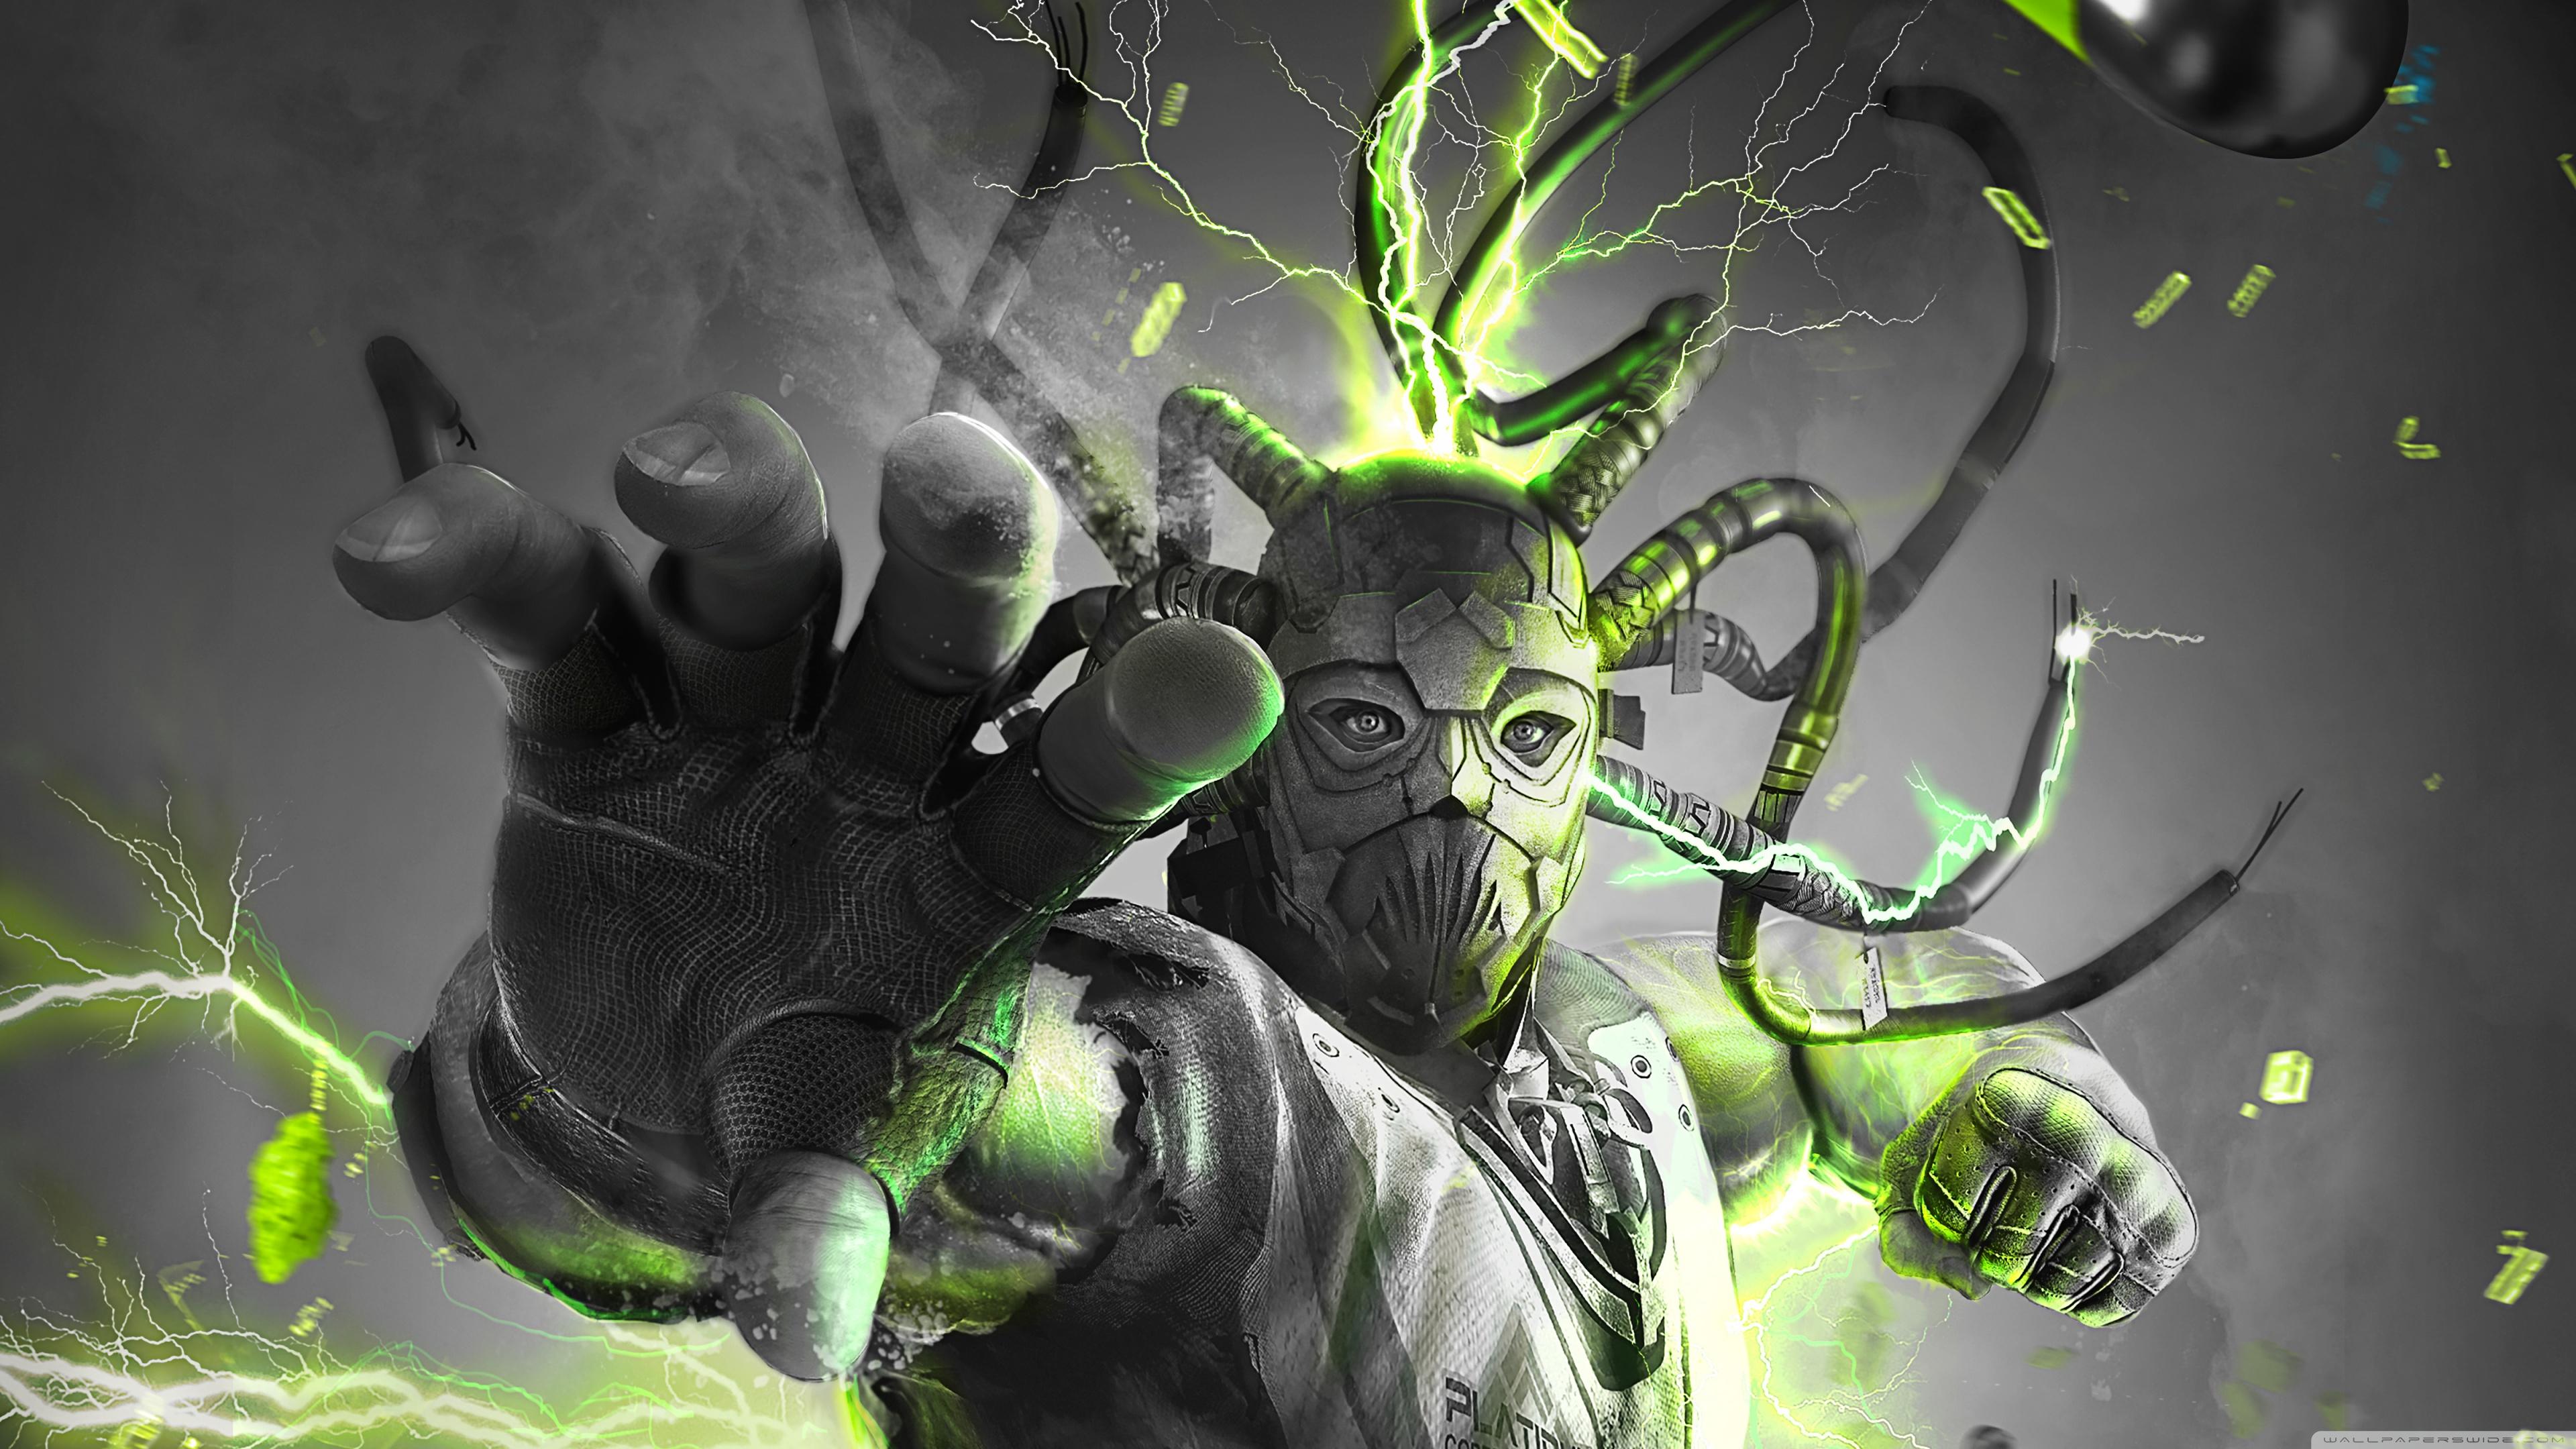 Lawbreakers Cronos Video Game Concept Art 4k Hd Desktop - Law Breakers , HD Wallpaper & Backgrounds